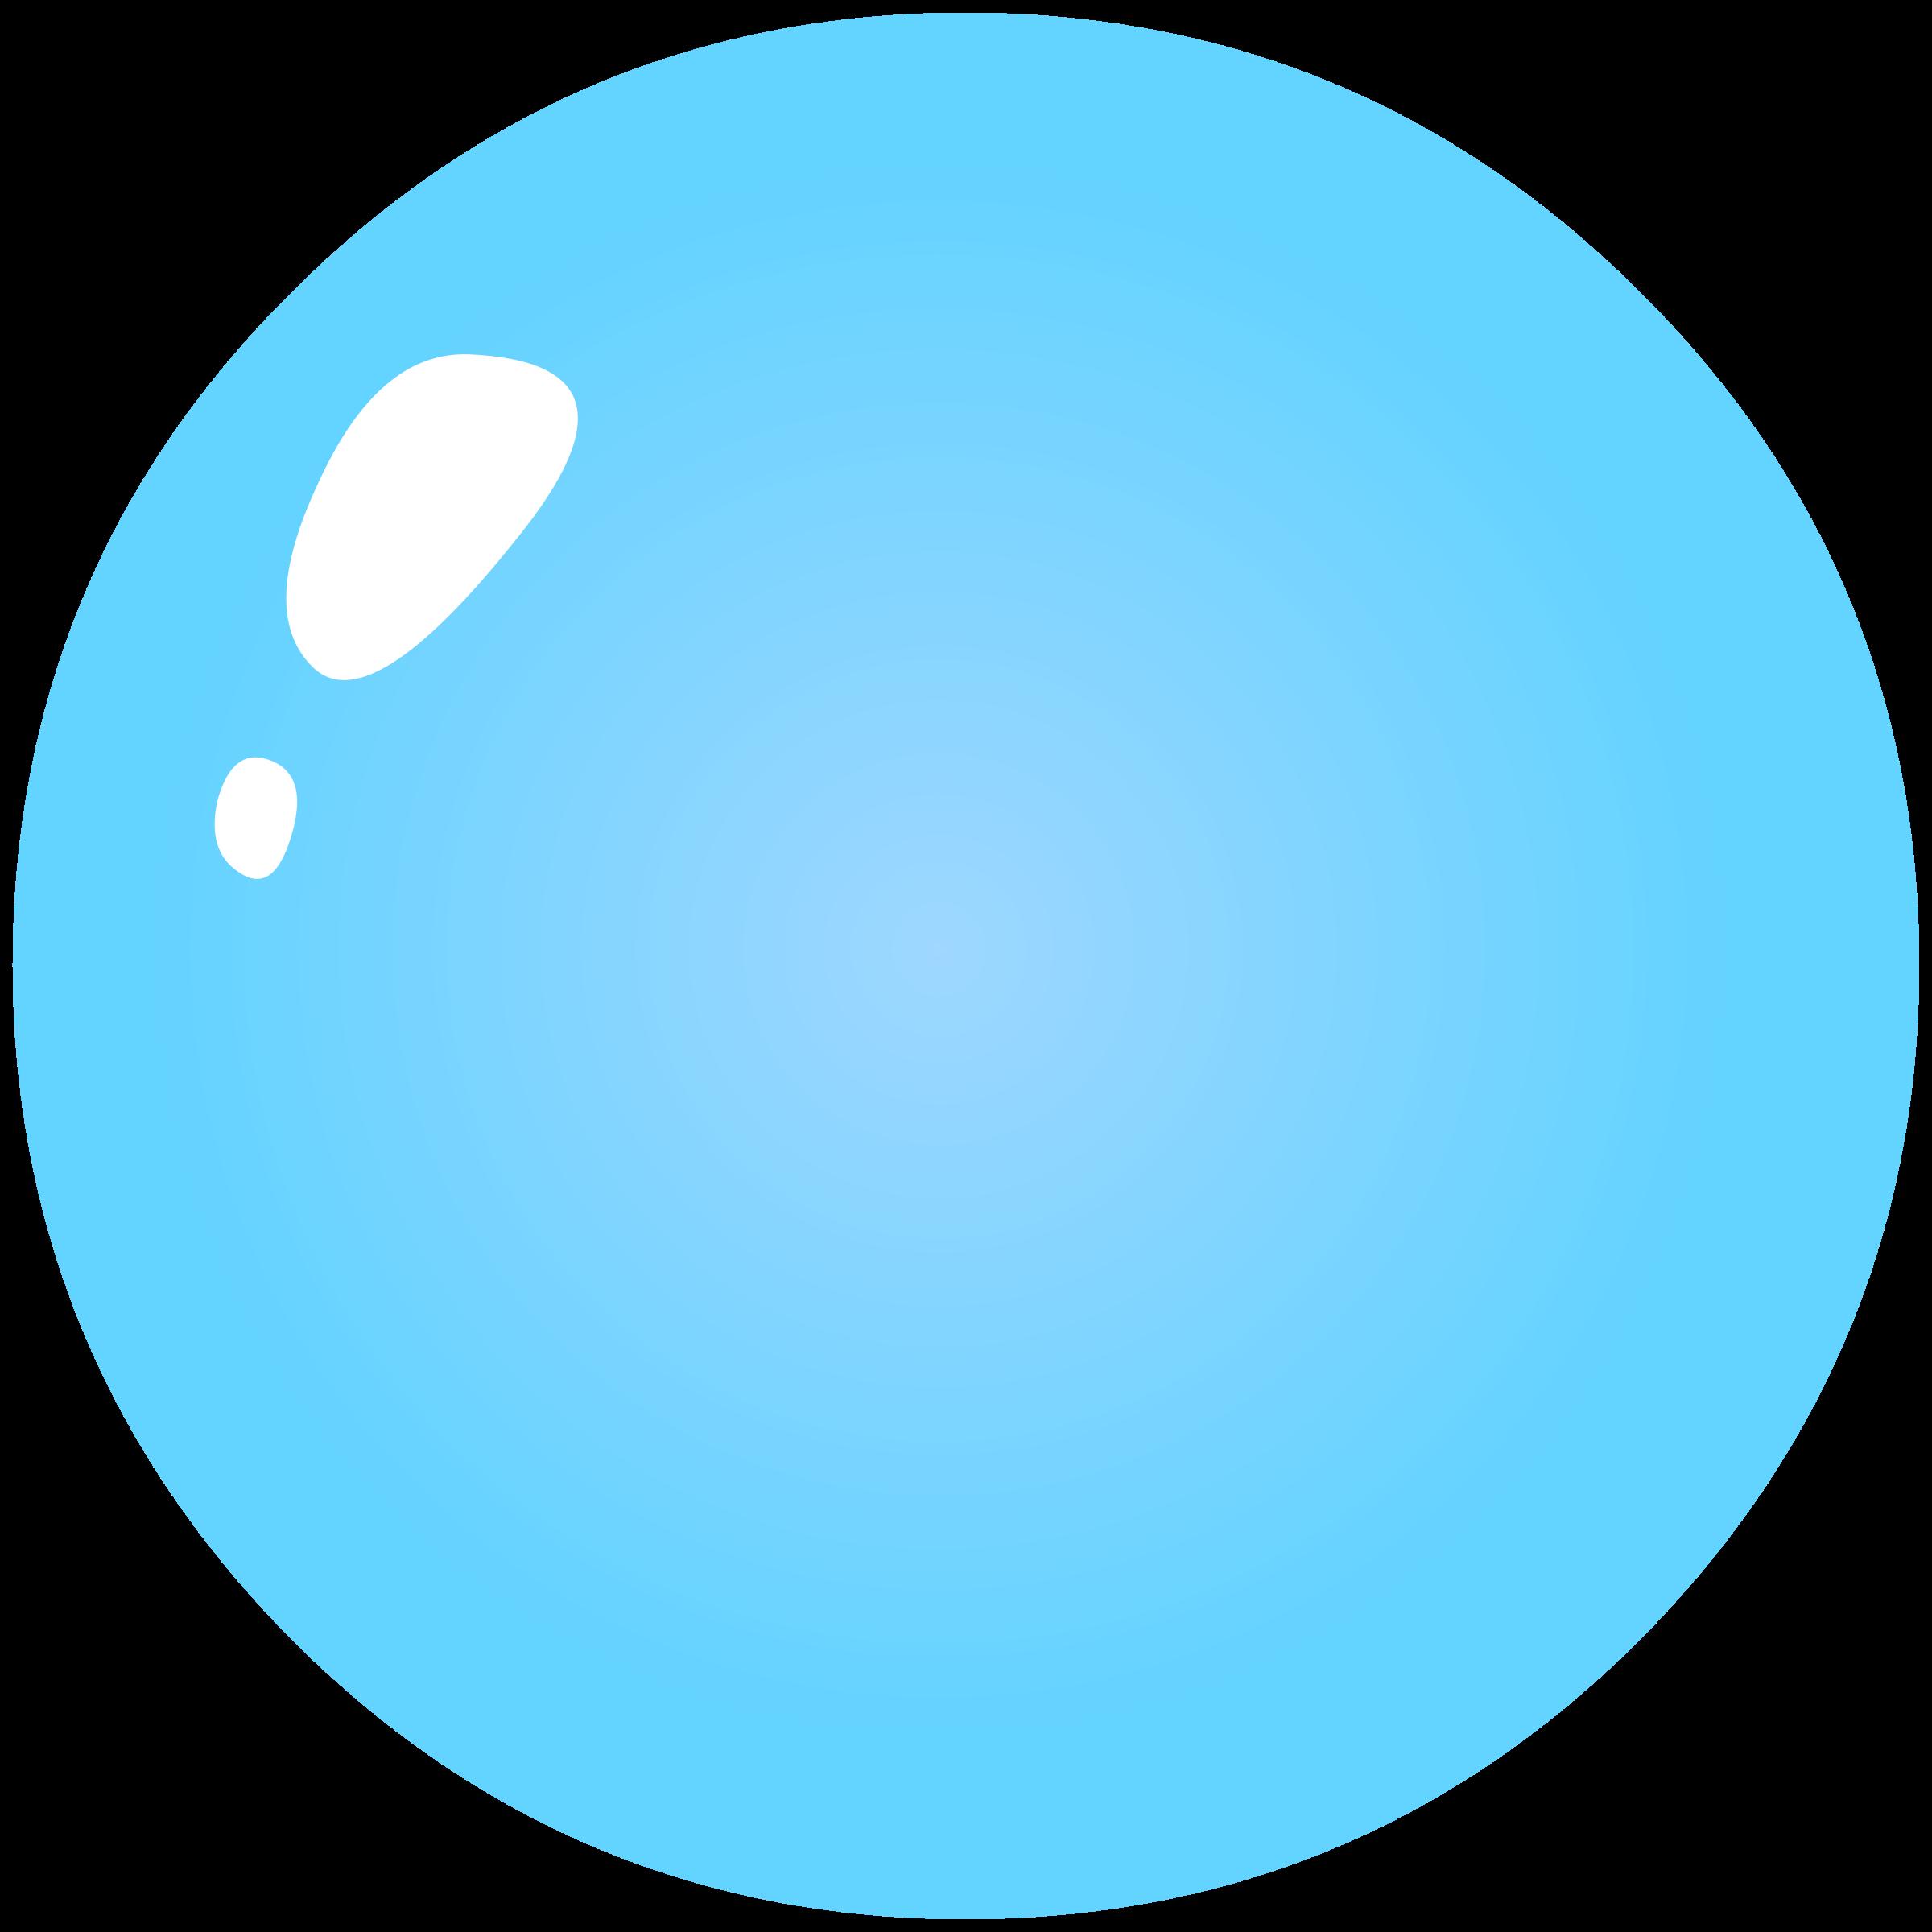 Clip art free panda. Background clipart bubble